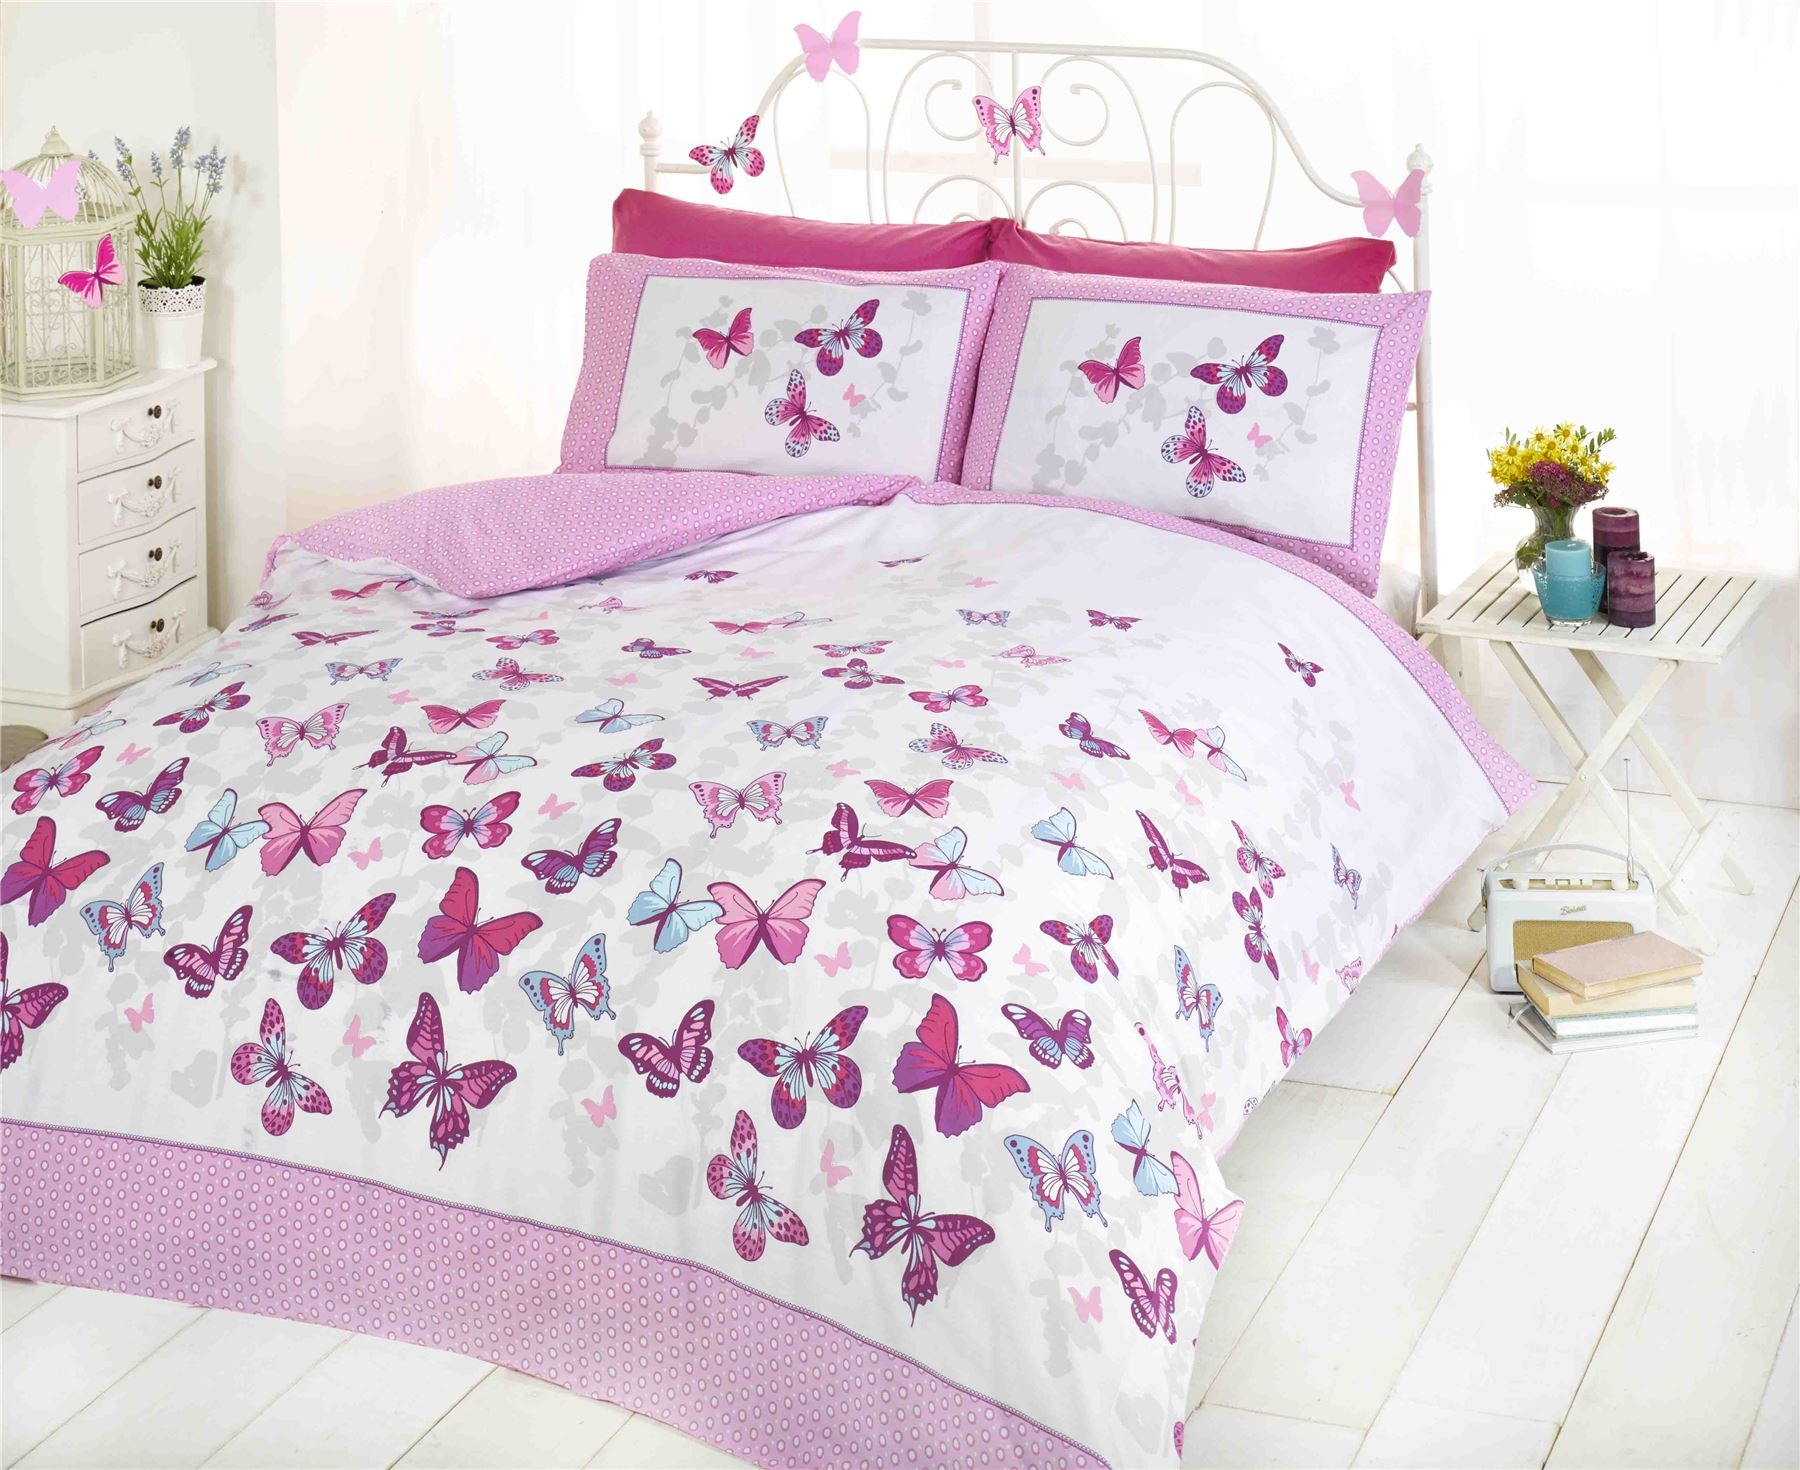 Bed cover in bedding ebay - Flutter Butterfly Butterflies Pink Girls Childrens Bedding Quilt Set Duvet Cover